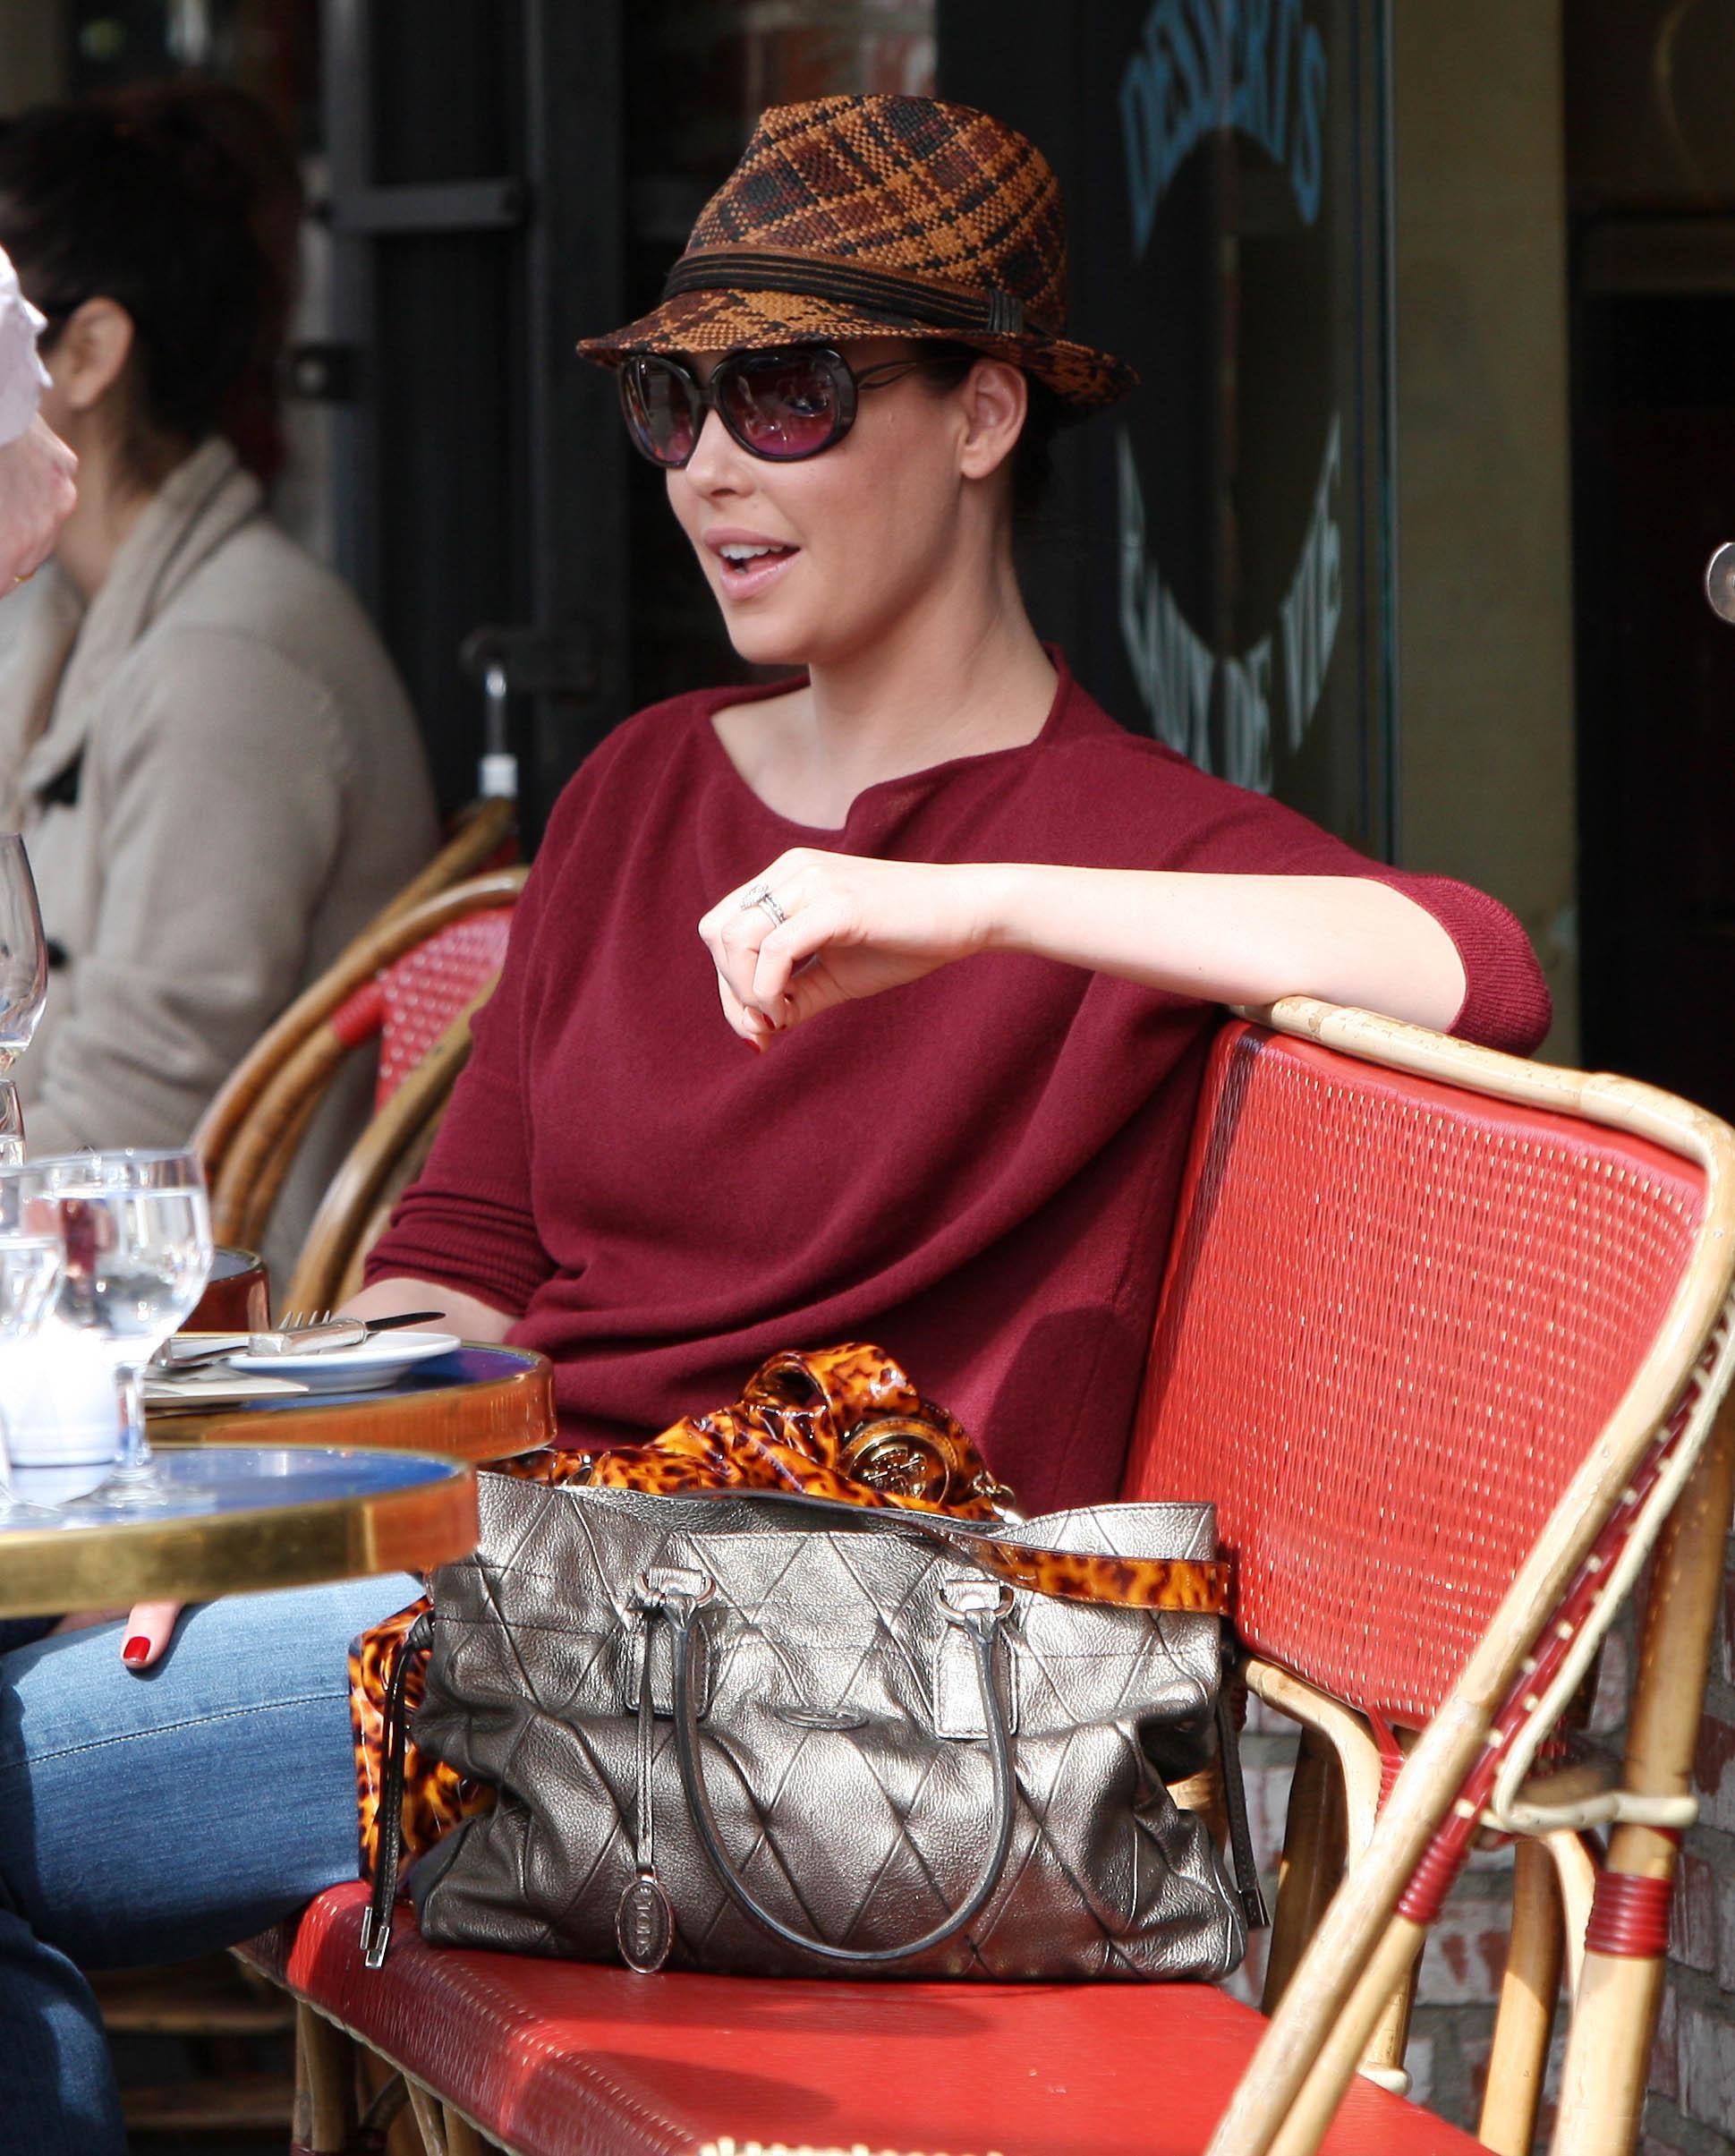 31646_Katherine_Heigl_having_lunch_at_Figaro_Cafein_Los_Feliz_March052010_010_122_894lo.jpg